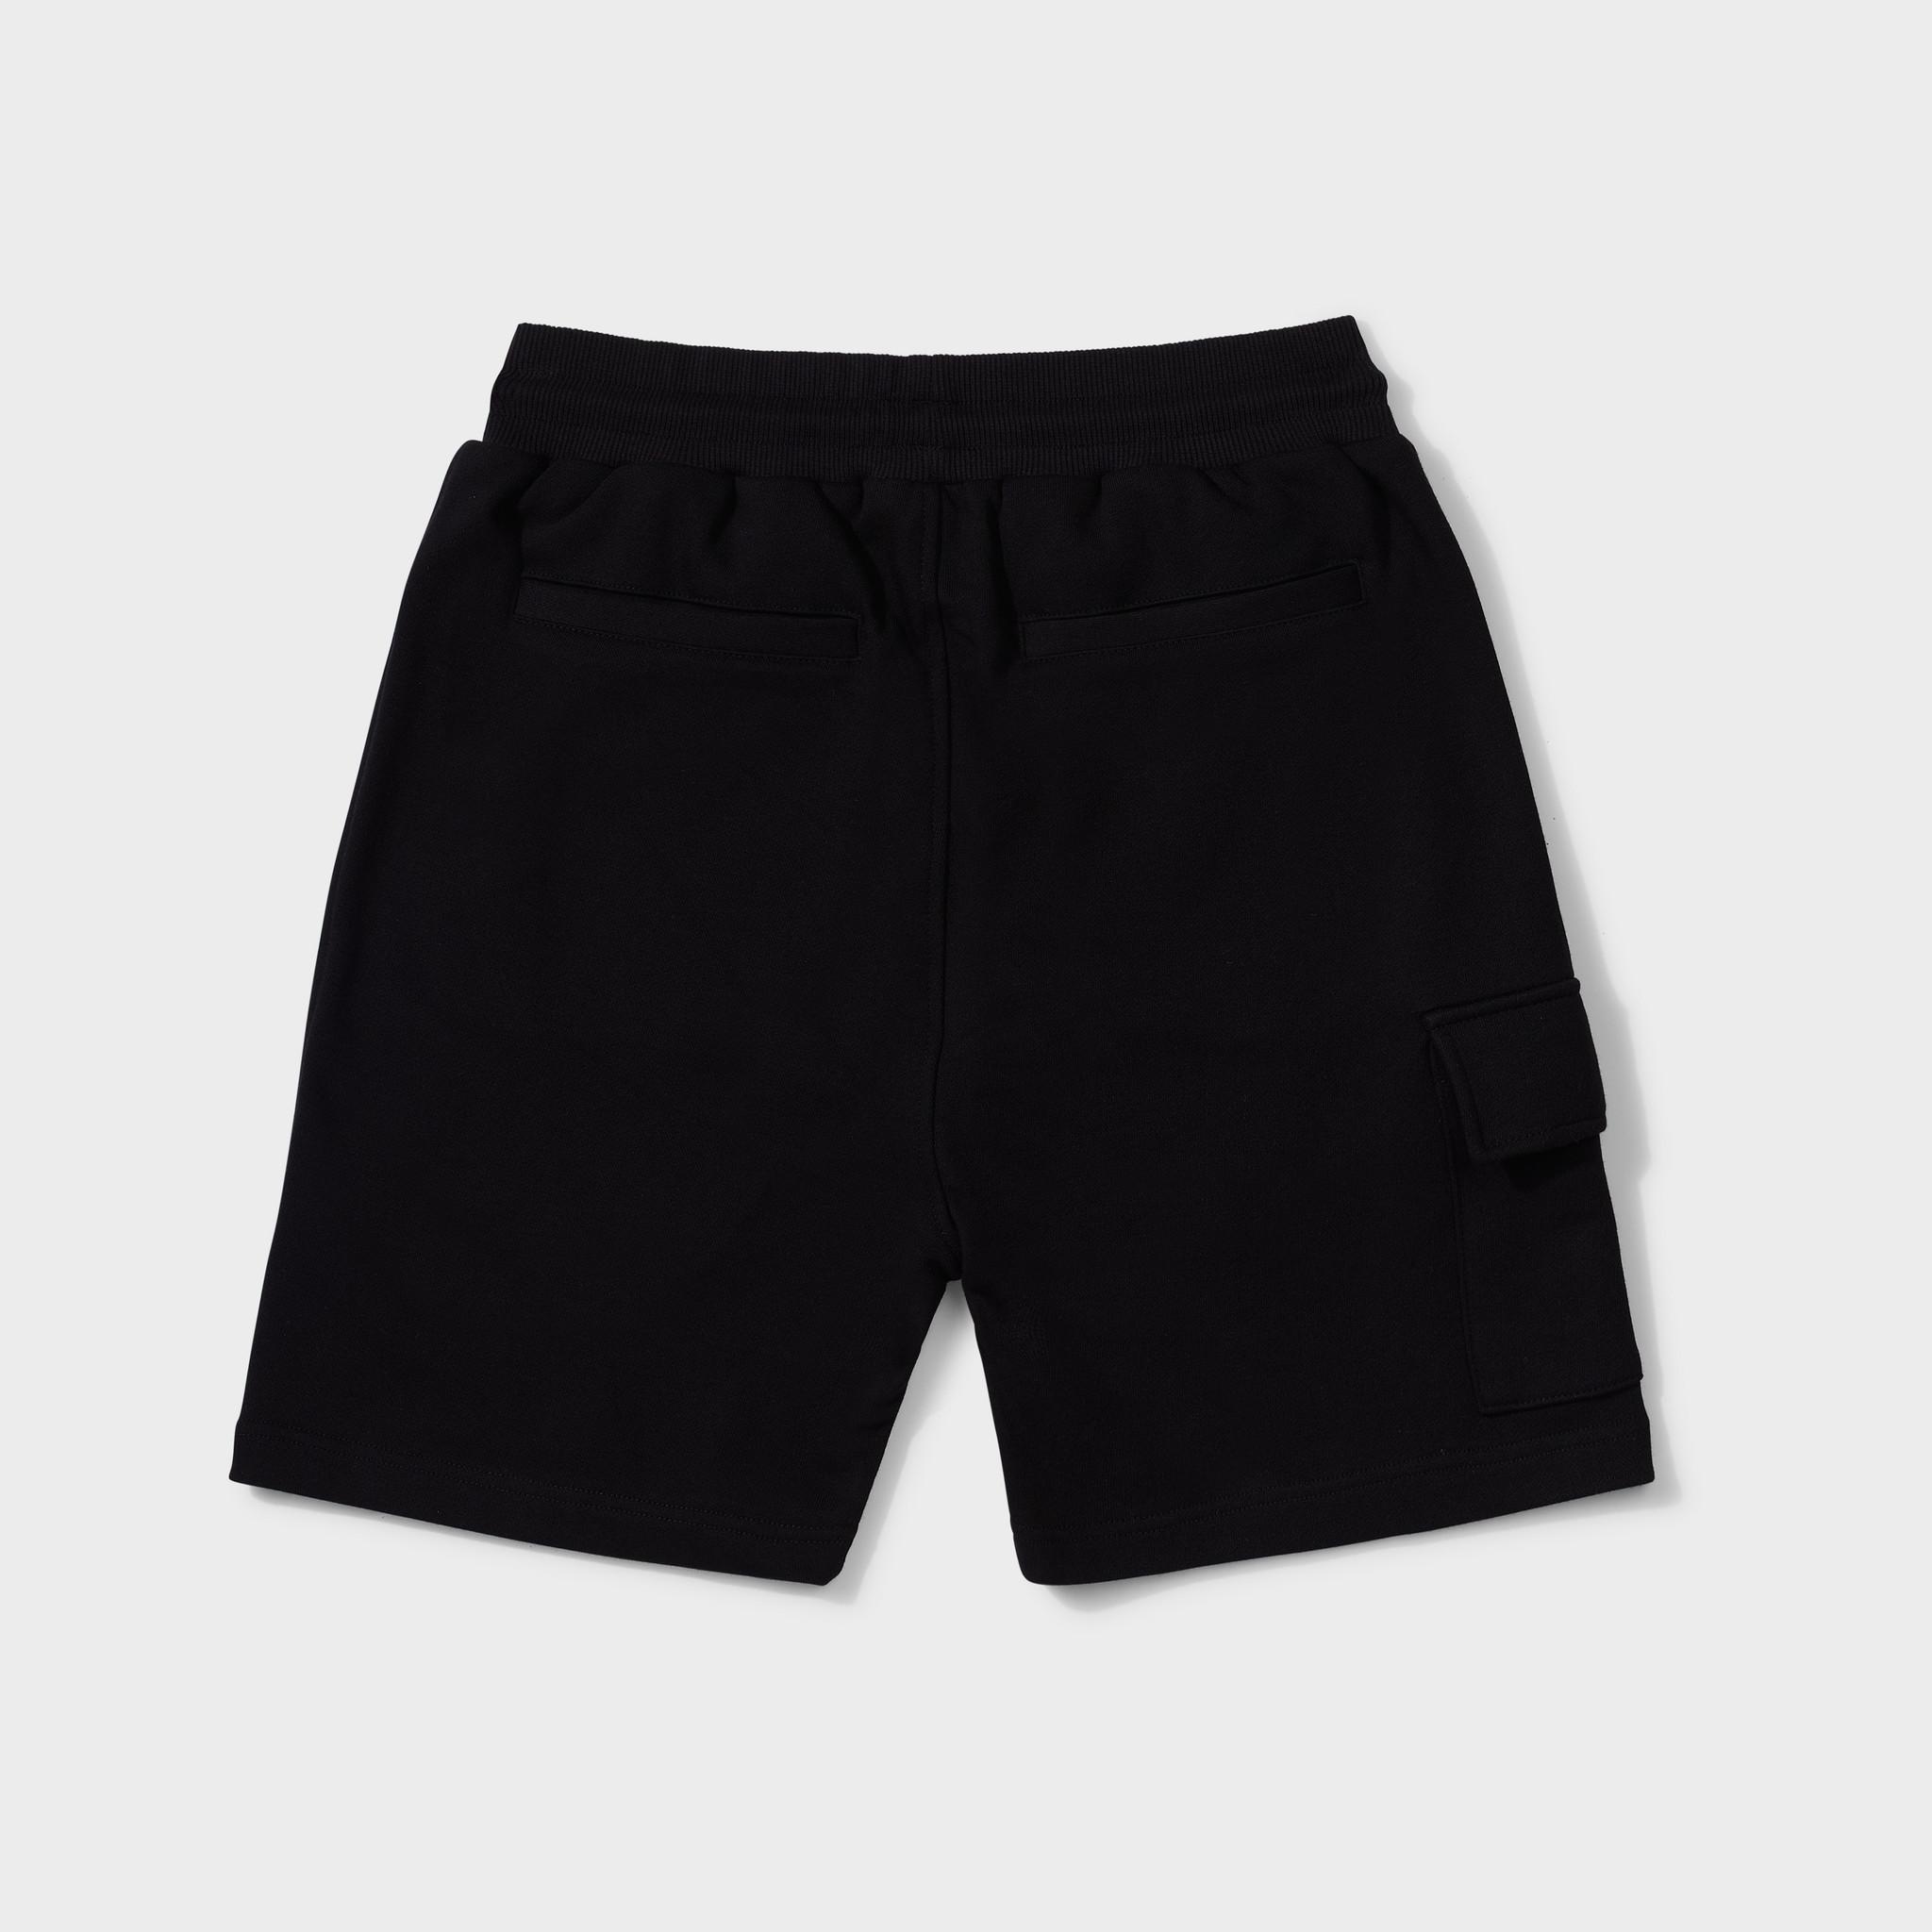 Wafi signature shorts black & neon yellow-2